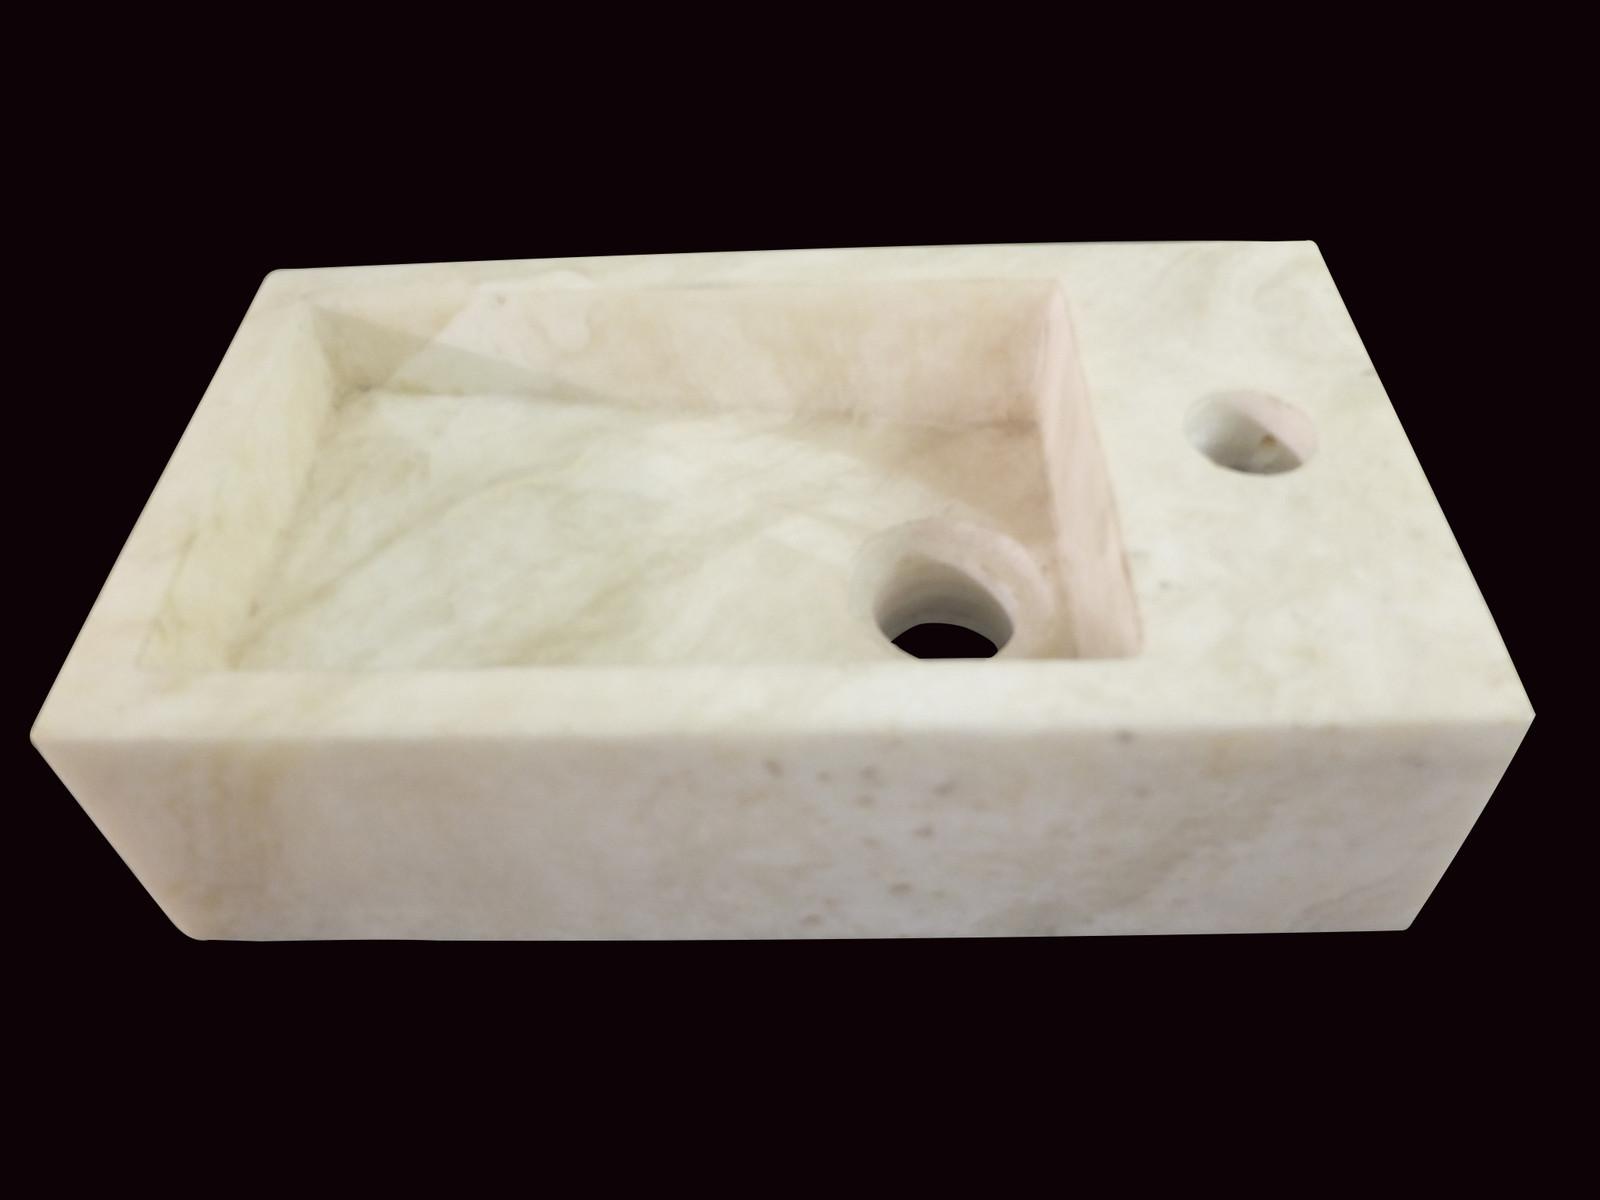 Onyx Sink : Onyx Sink 36 cm x 20 cm x 10 cm ( st34 ) Tiso